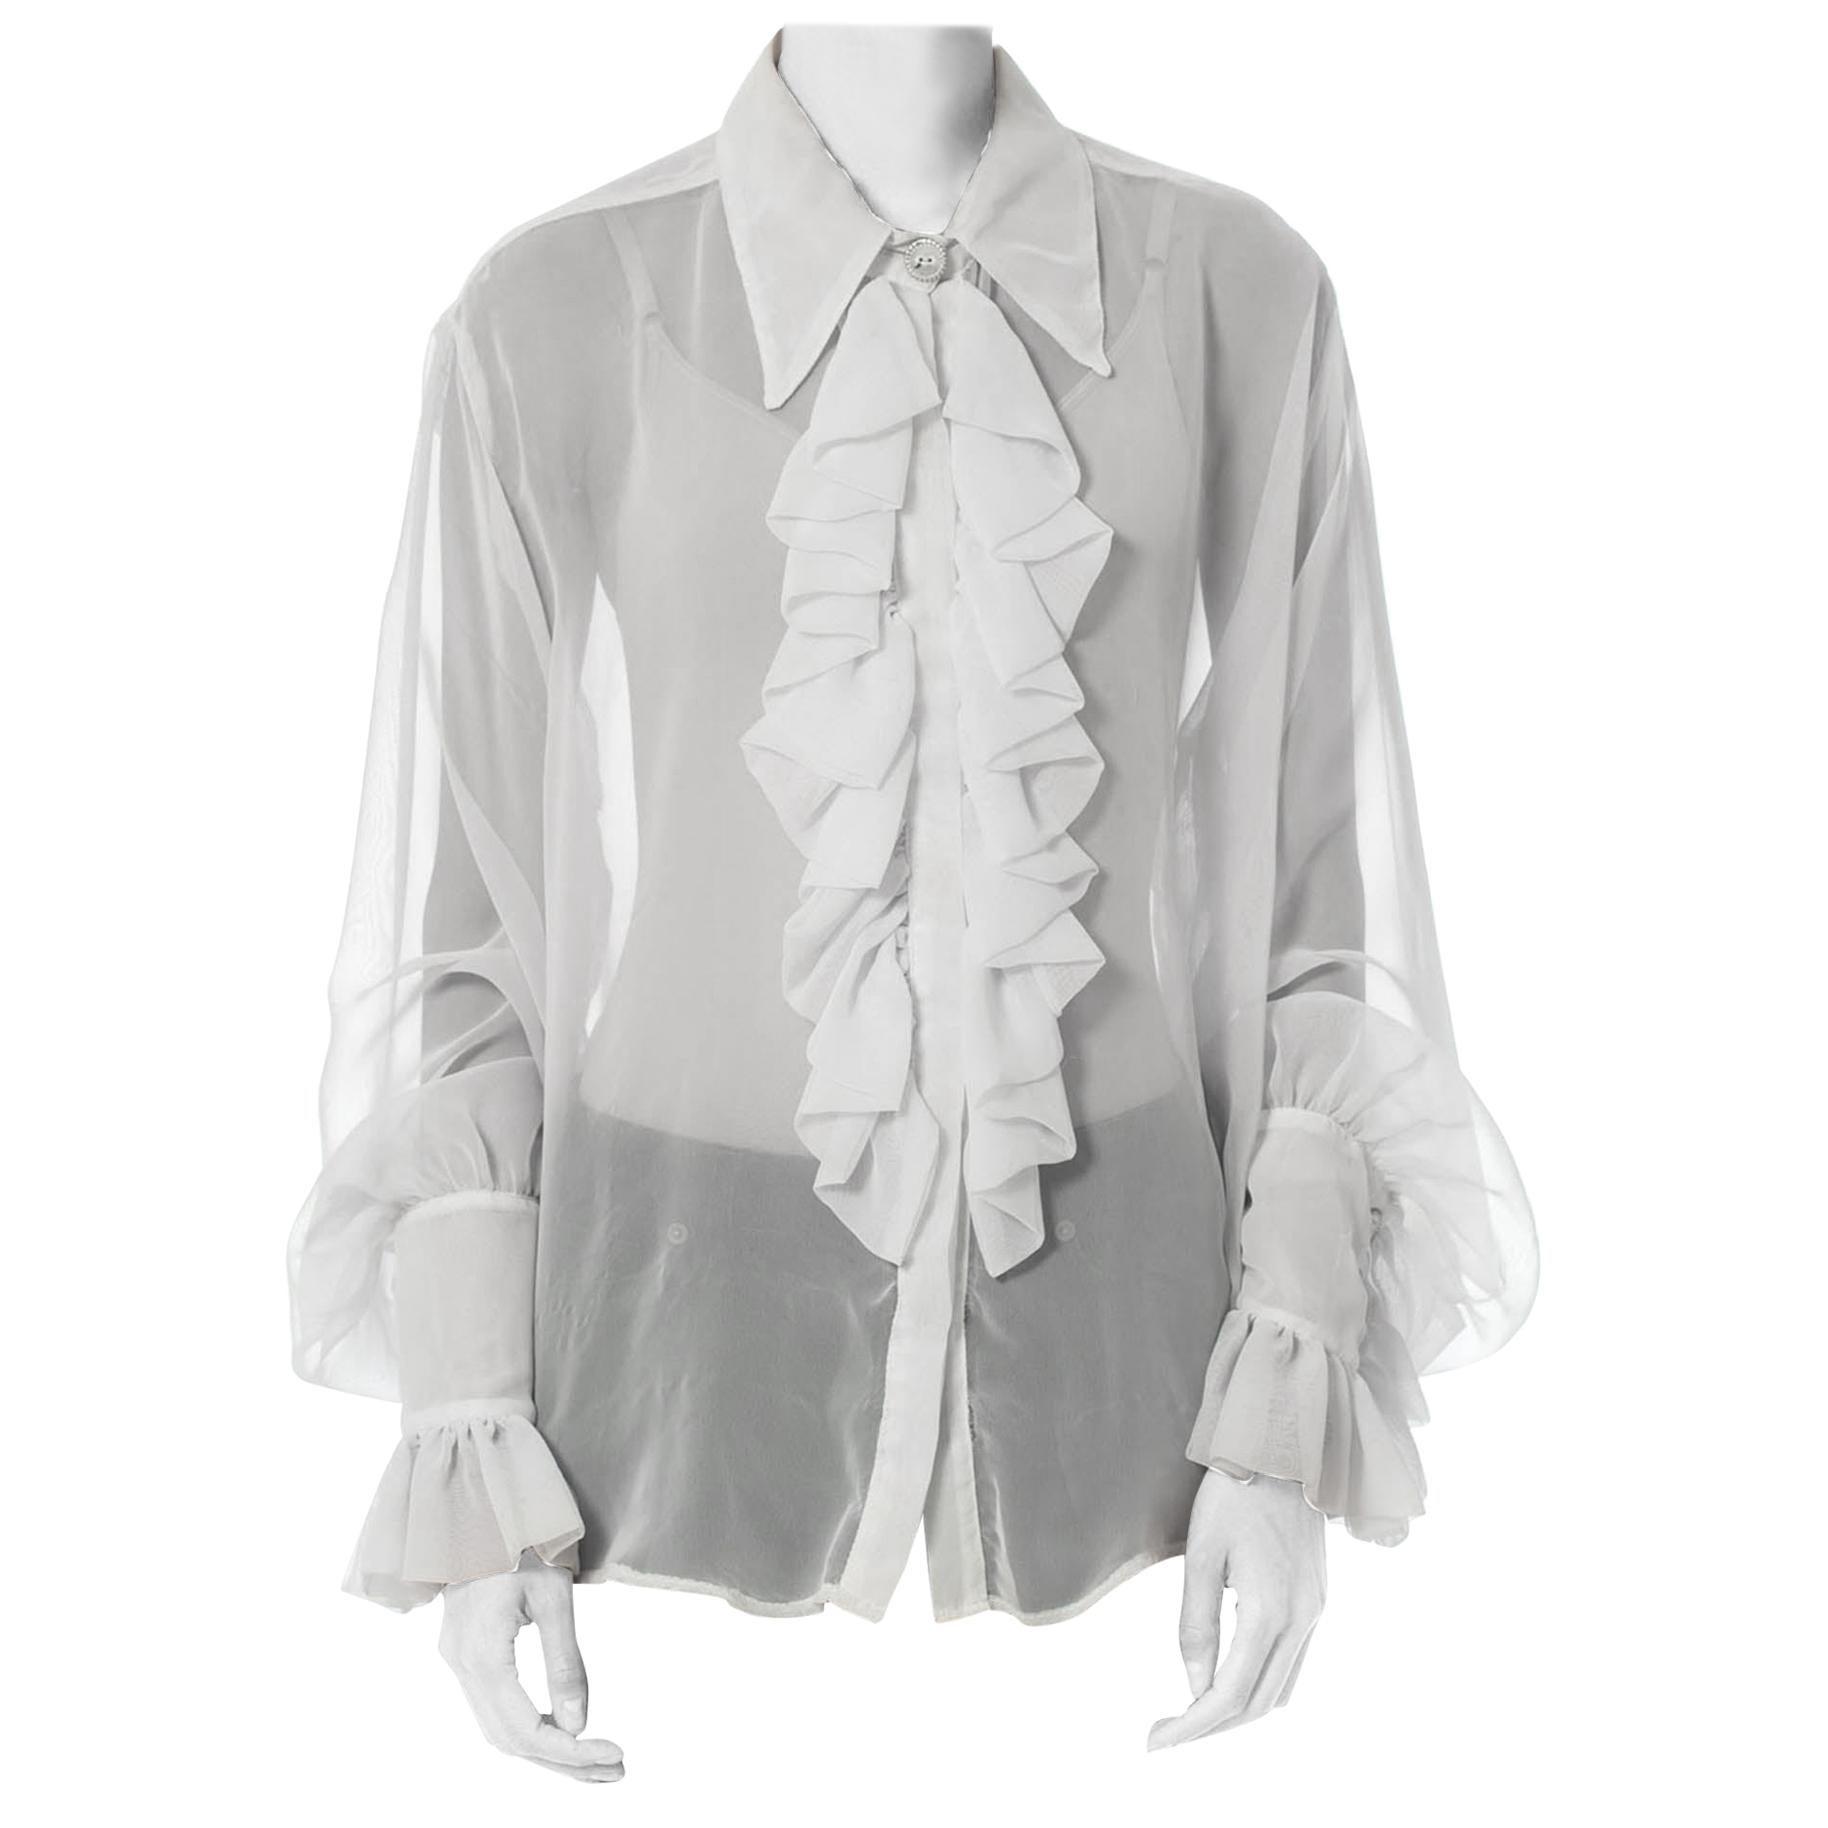 Black Lace Blouse  1990s  Sheer Ruffled Shirt  Size 12